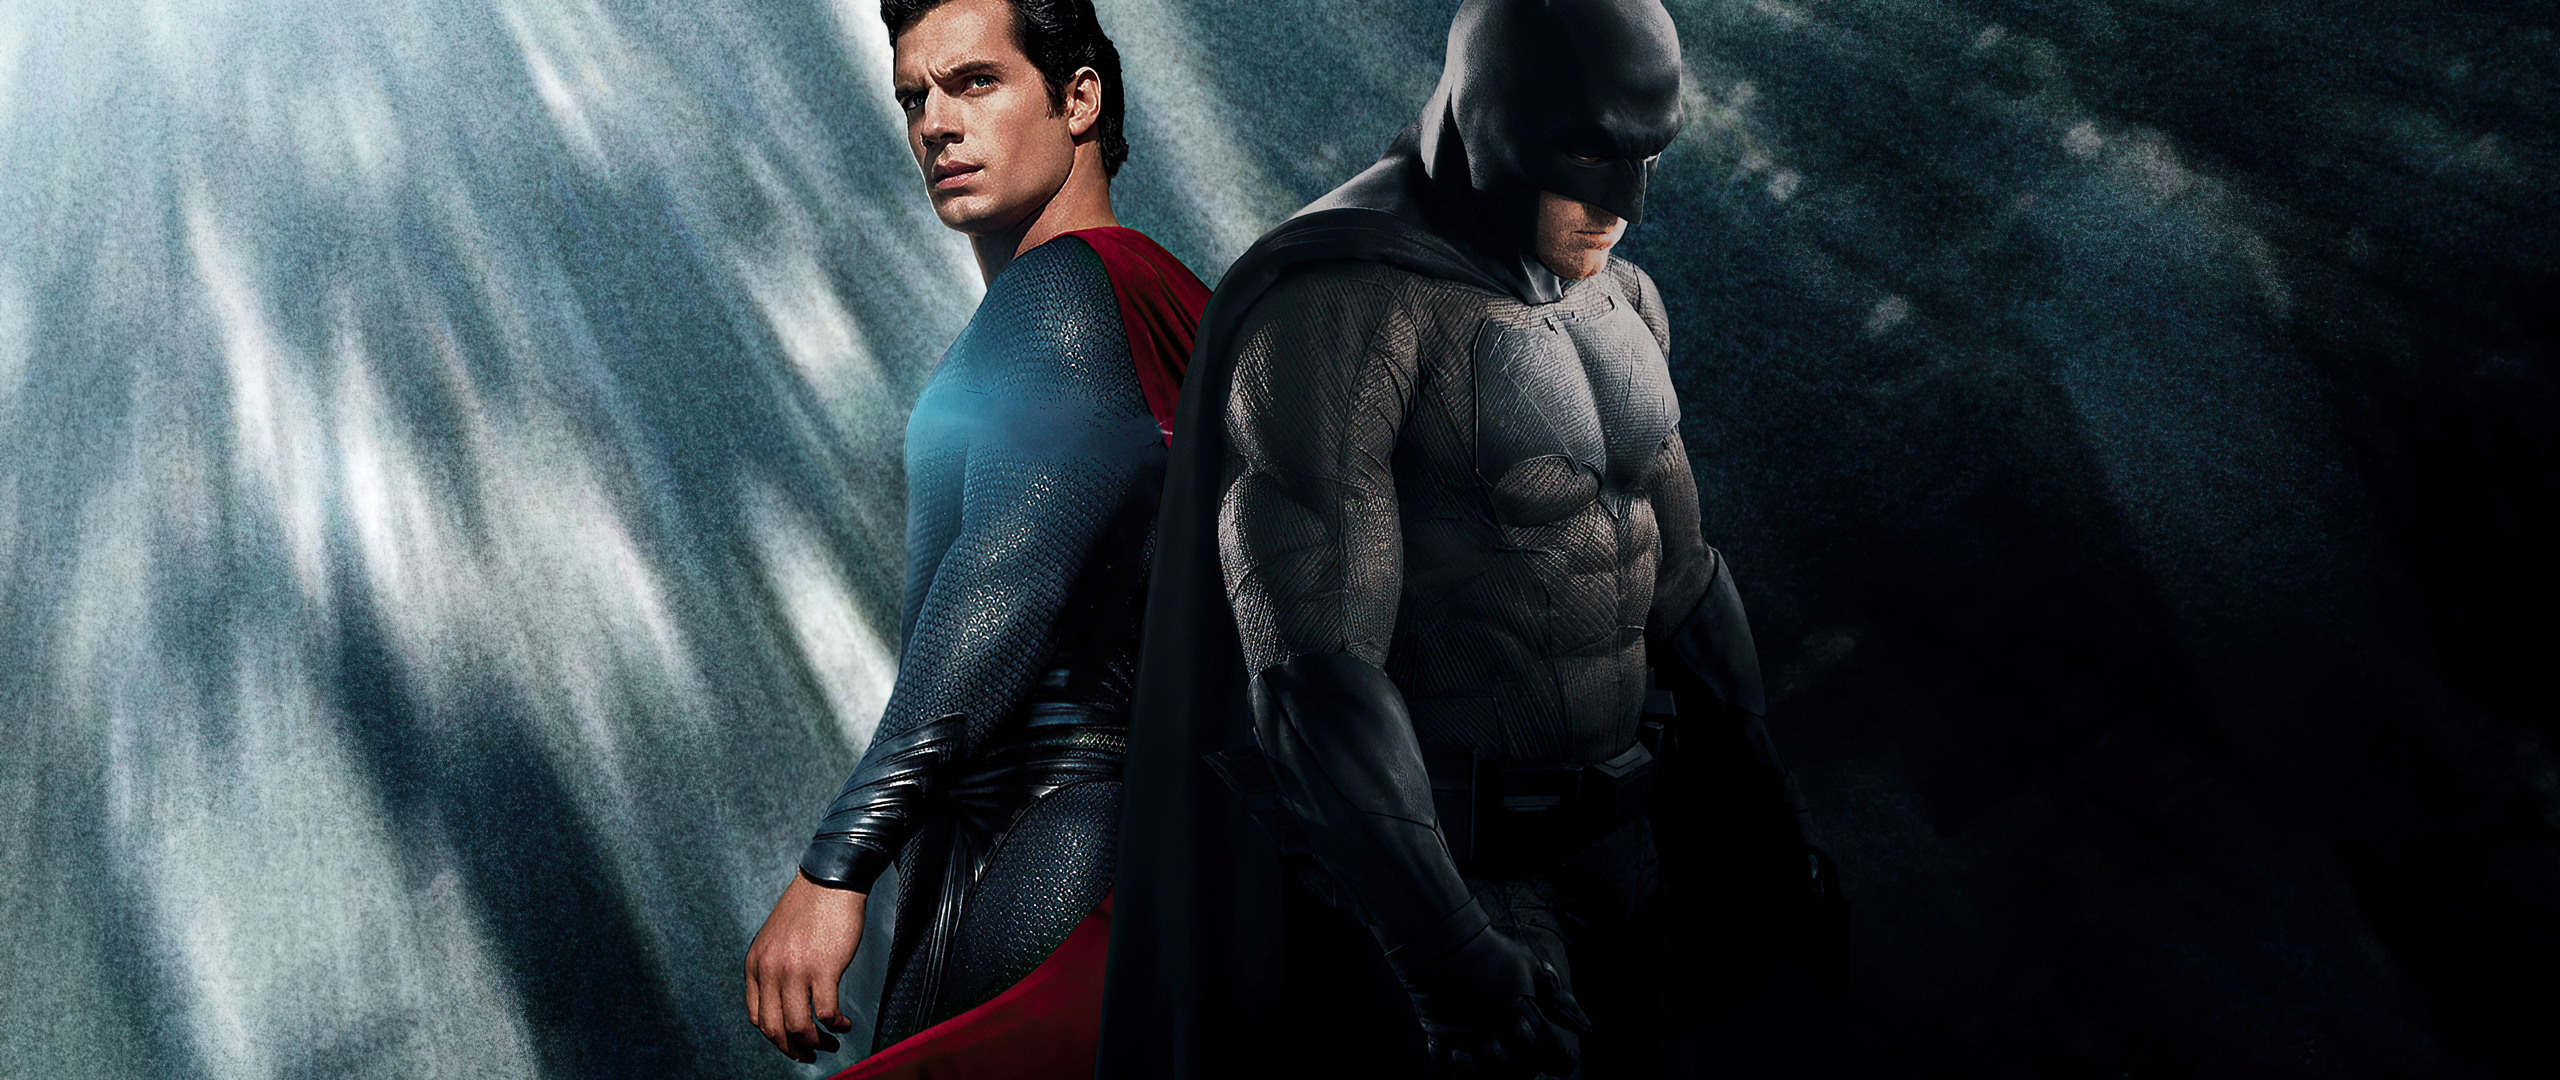 2560x1080 Batman Vs Superman Standing 4k 2560x1080 ...